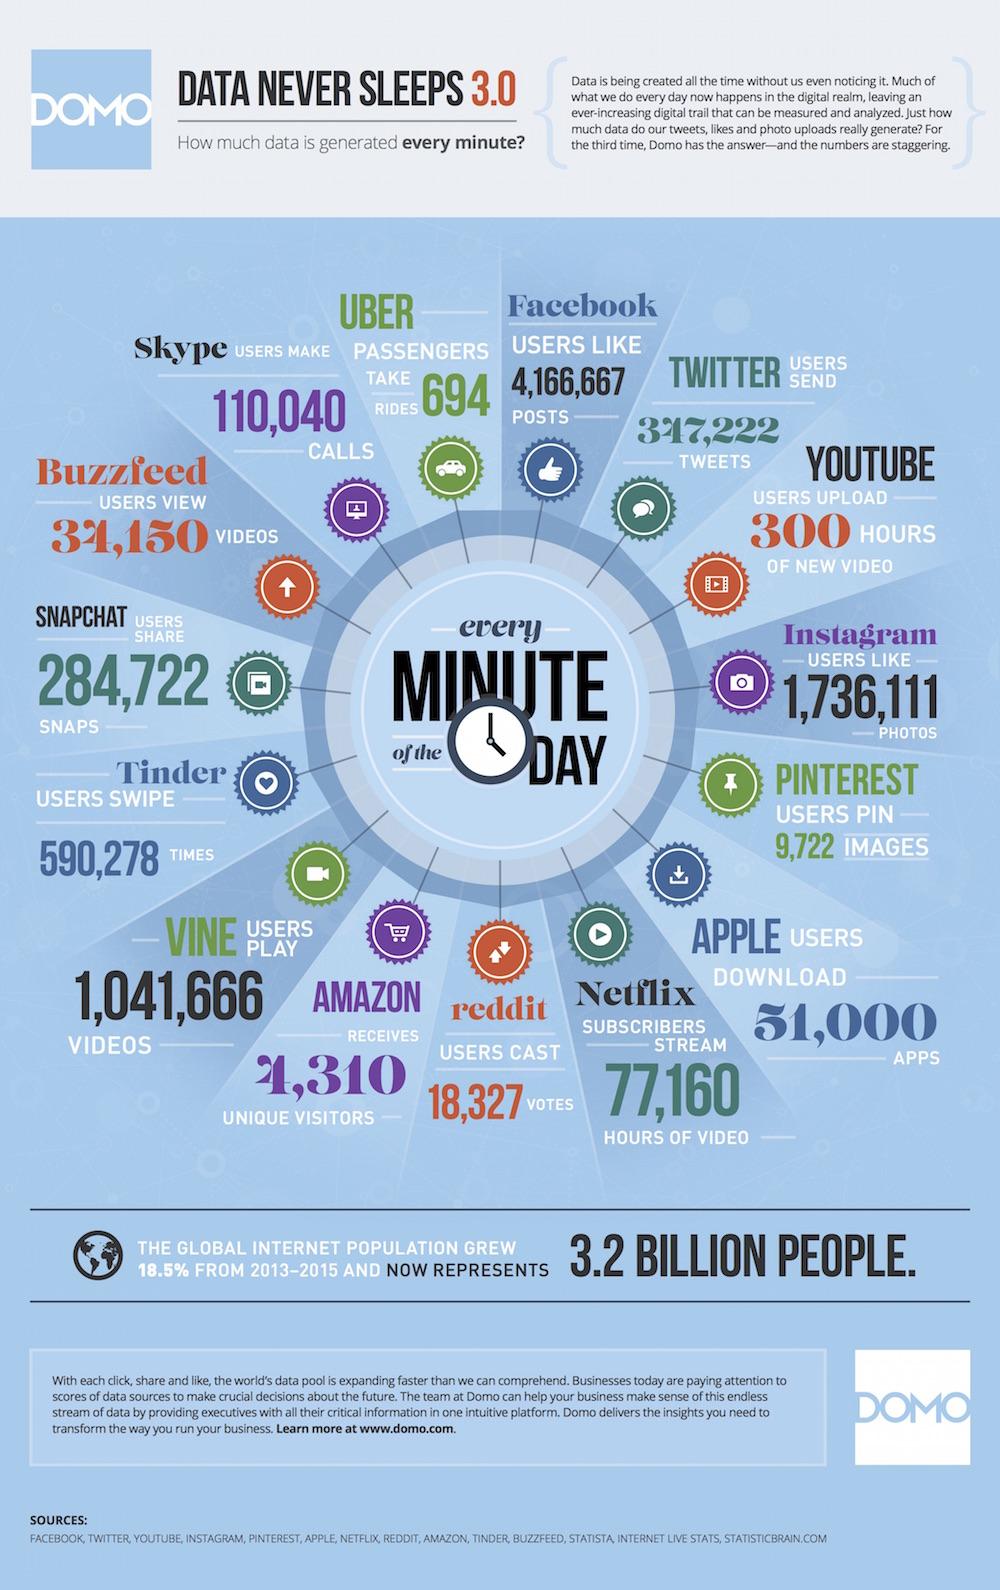 data-LG-infographic-domo-160915